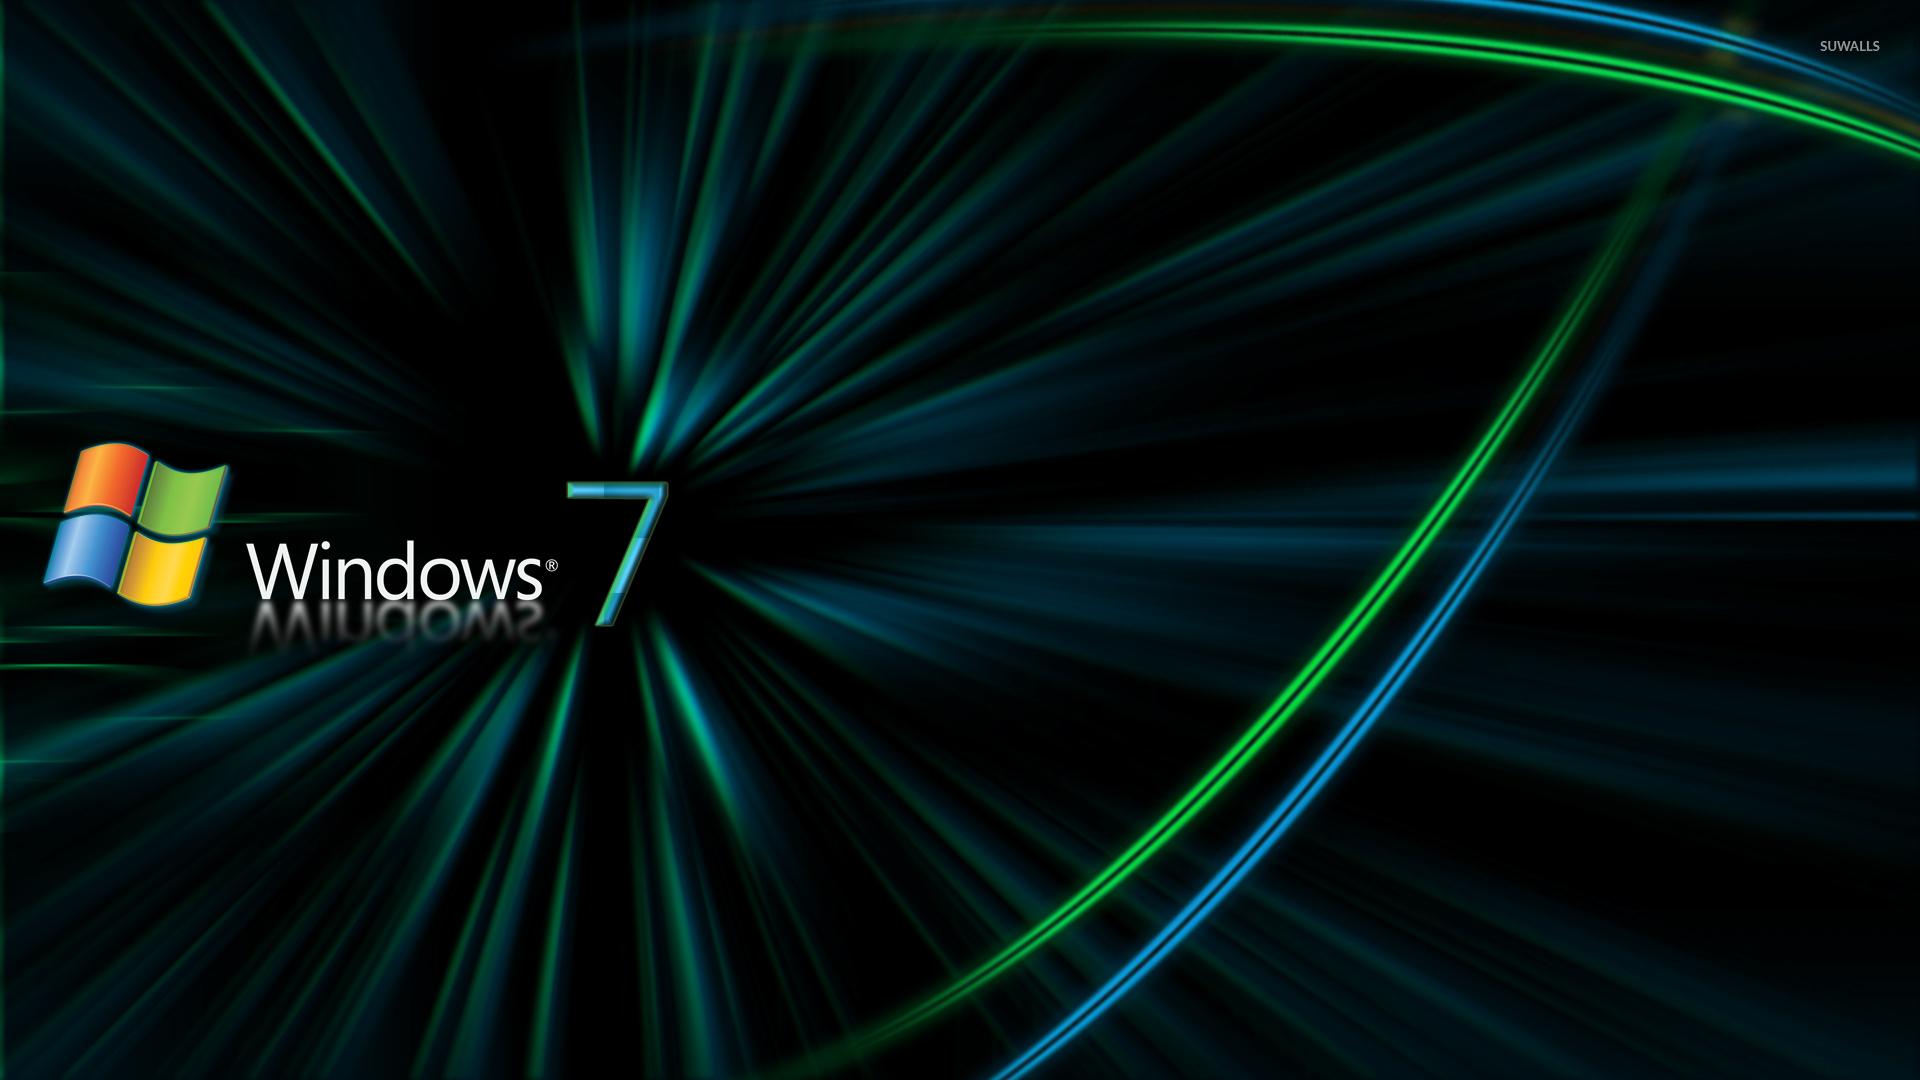 Windows 7 2 Wallpaper Computer Wallpapers 6495